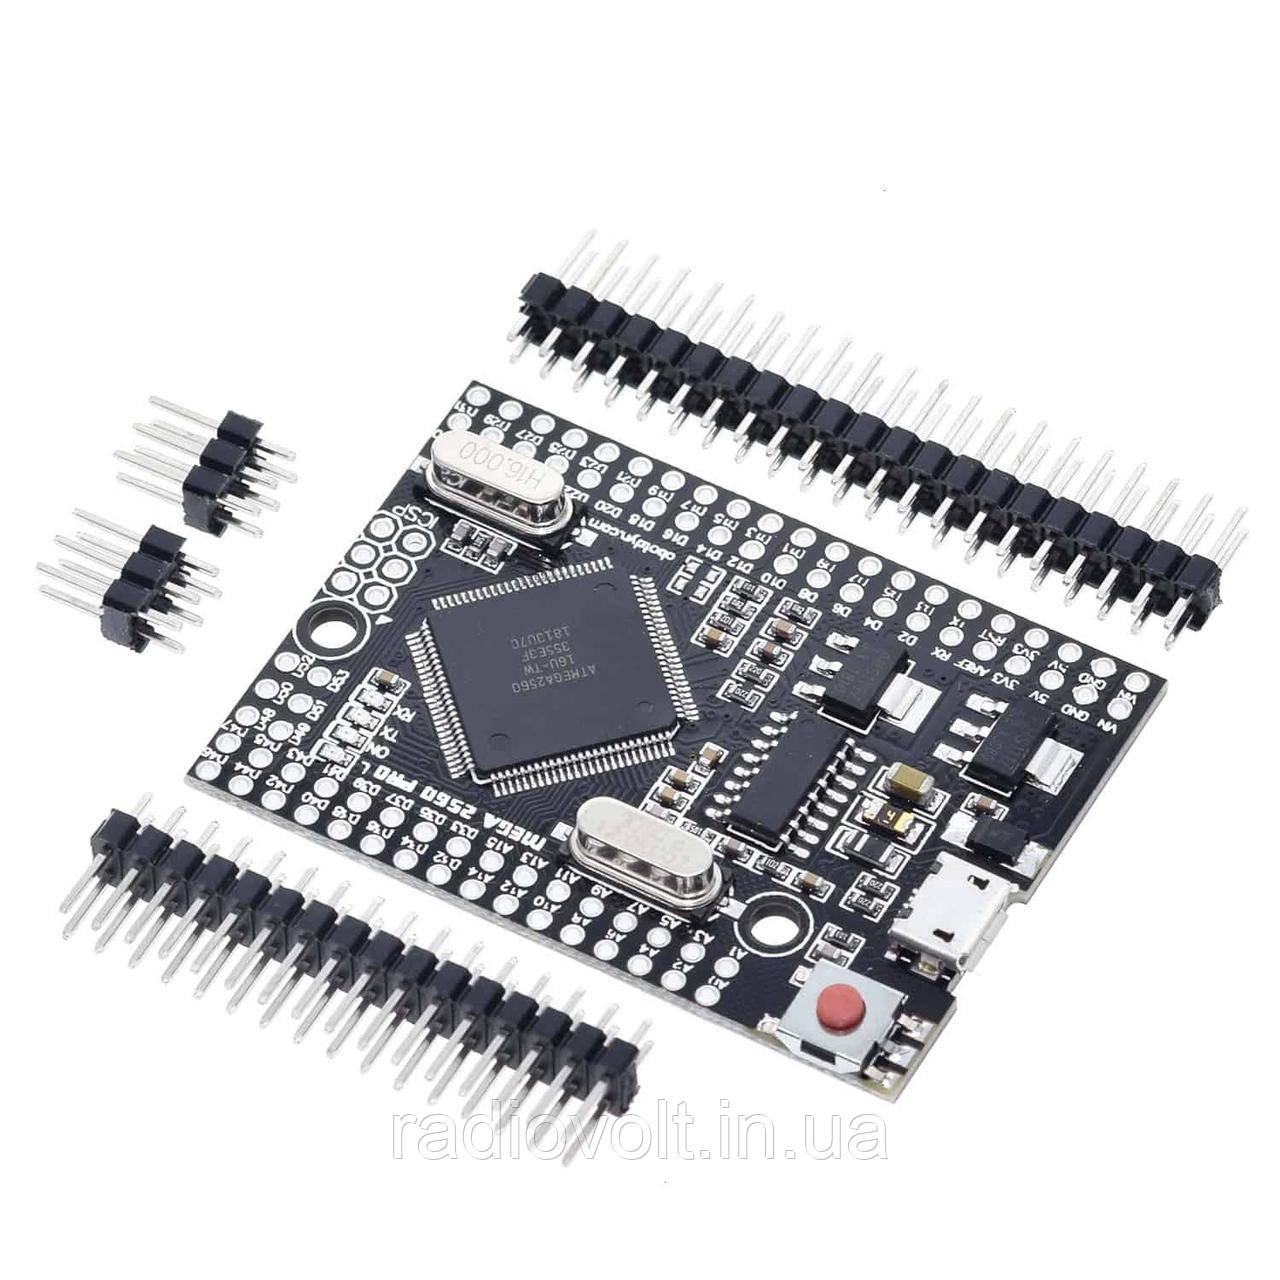 Arduino Mega 2560 PRO, ATmega2560-16AU, MicroUSB CH340G